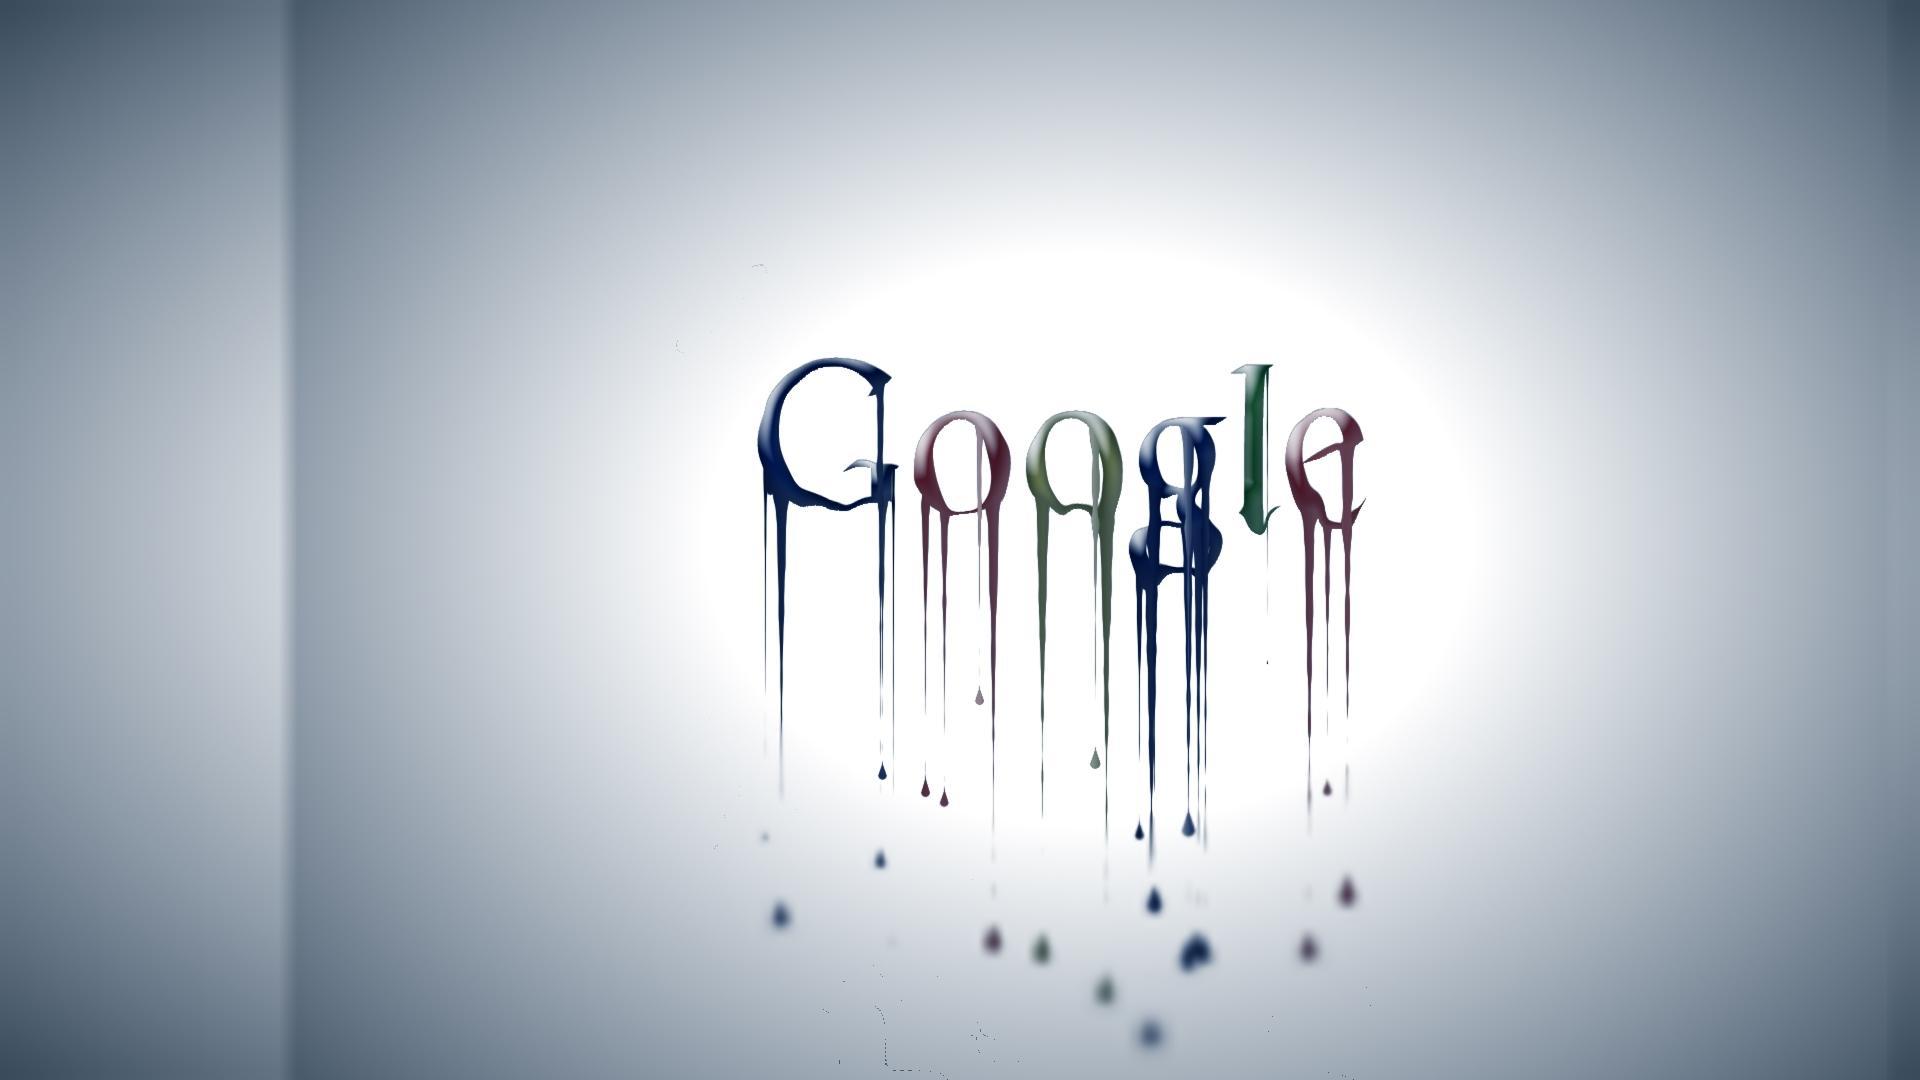 Google themes themebeta - Google Themes Themebeta 26